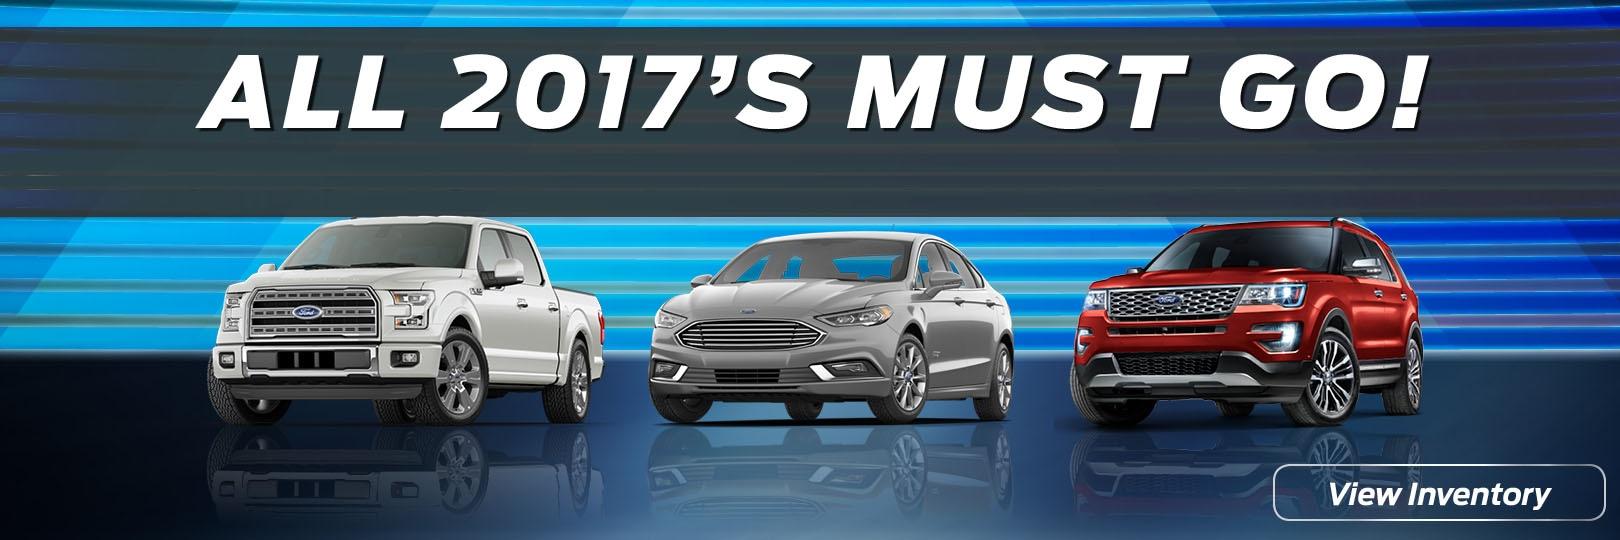 Cutter Dodge Honolulu >> Hawaii New & Used Car Dealer   Honolulu, Oahu & Waipahu Auto Sales   Focus, Fiesta, Flex ...